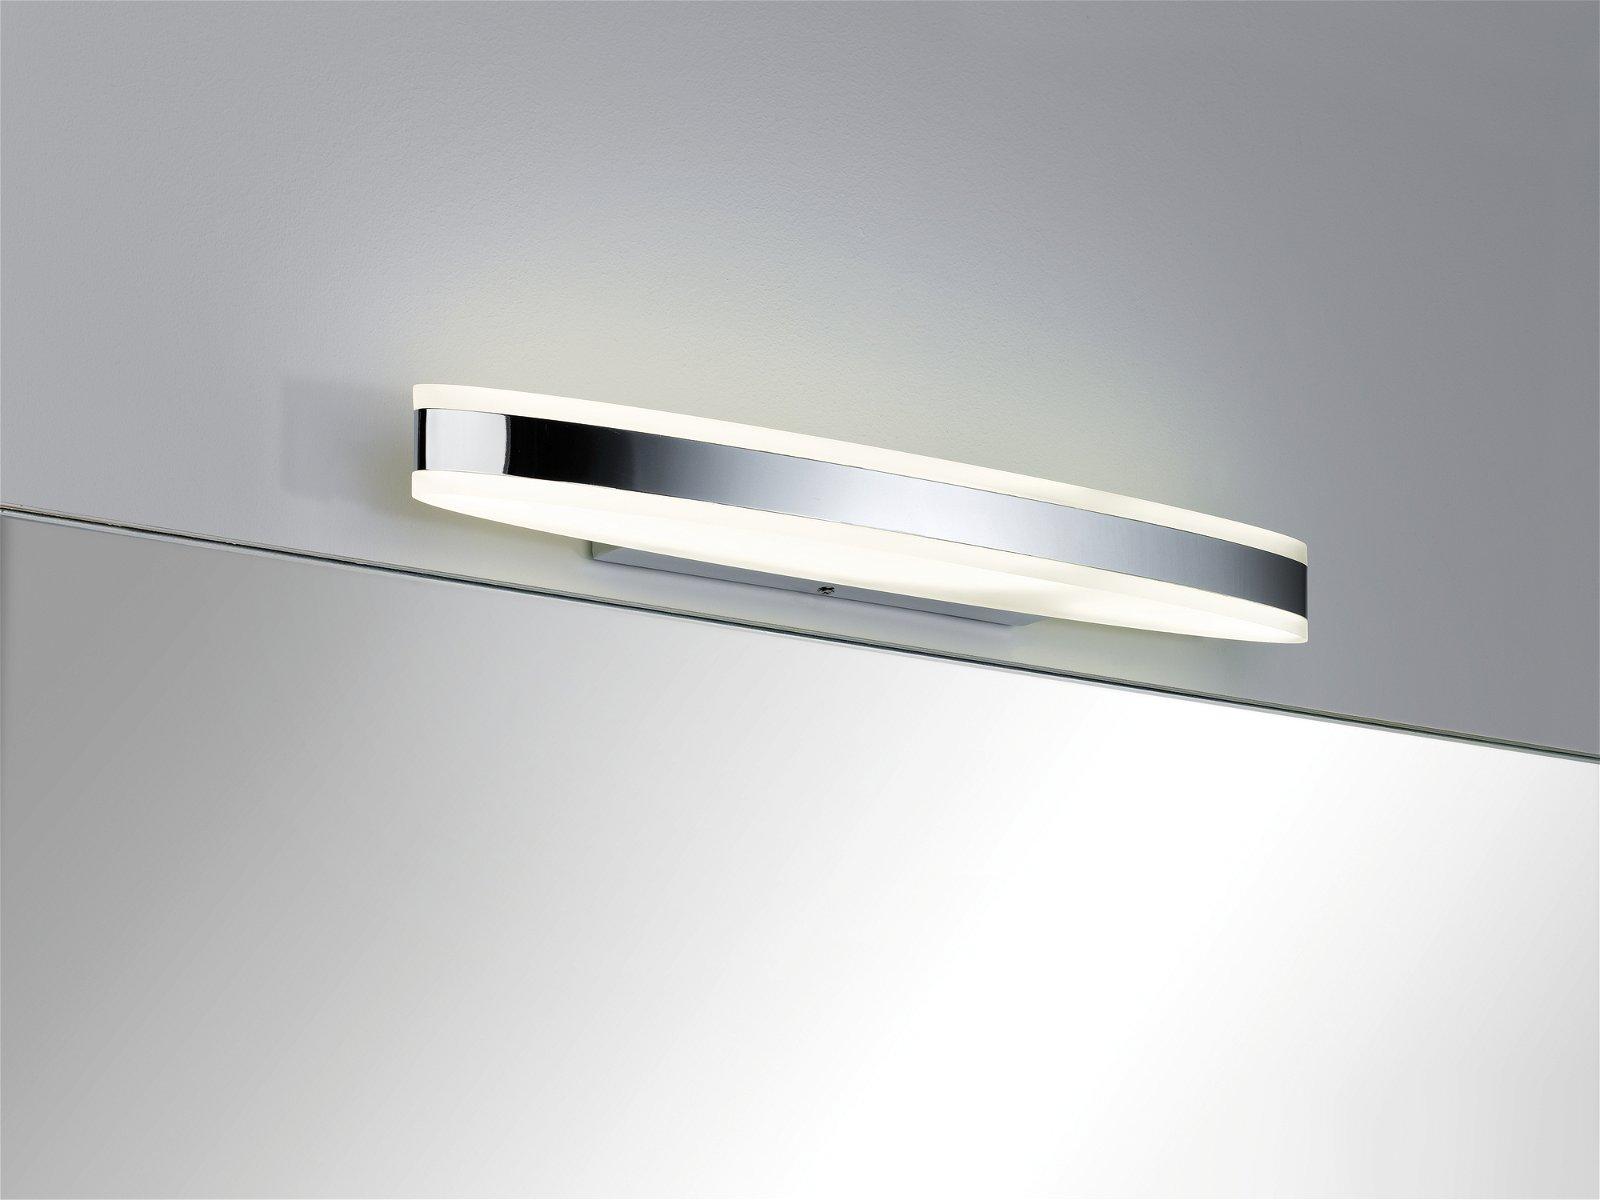 LED-spiegellamp Kuma IP44 3000K 660lm 230V 9W Chroom/Wit